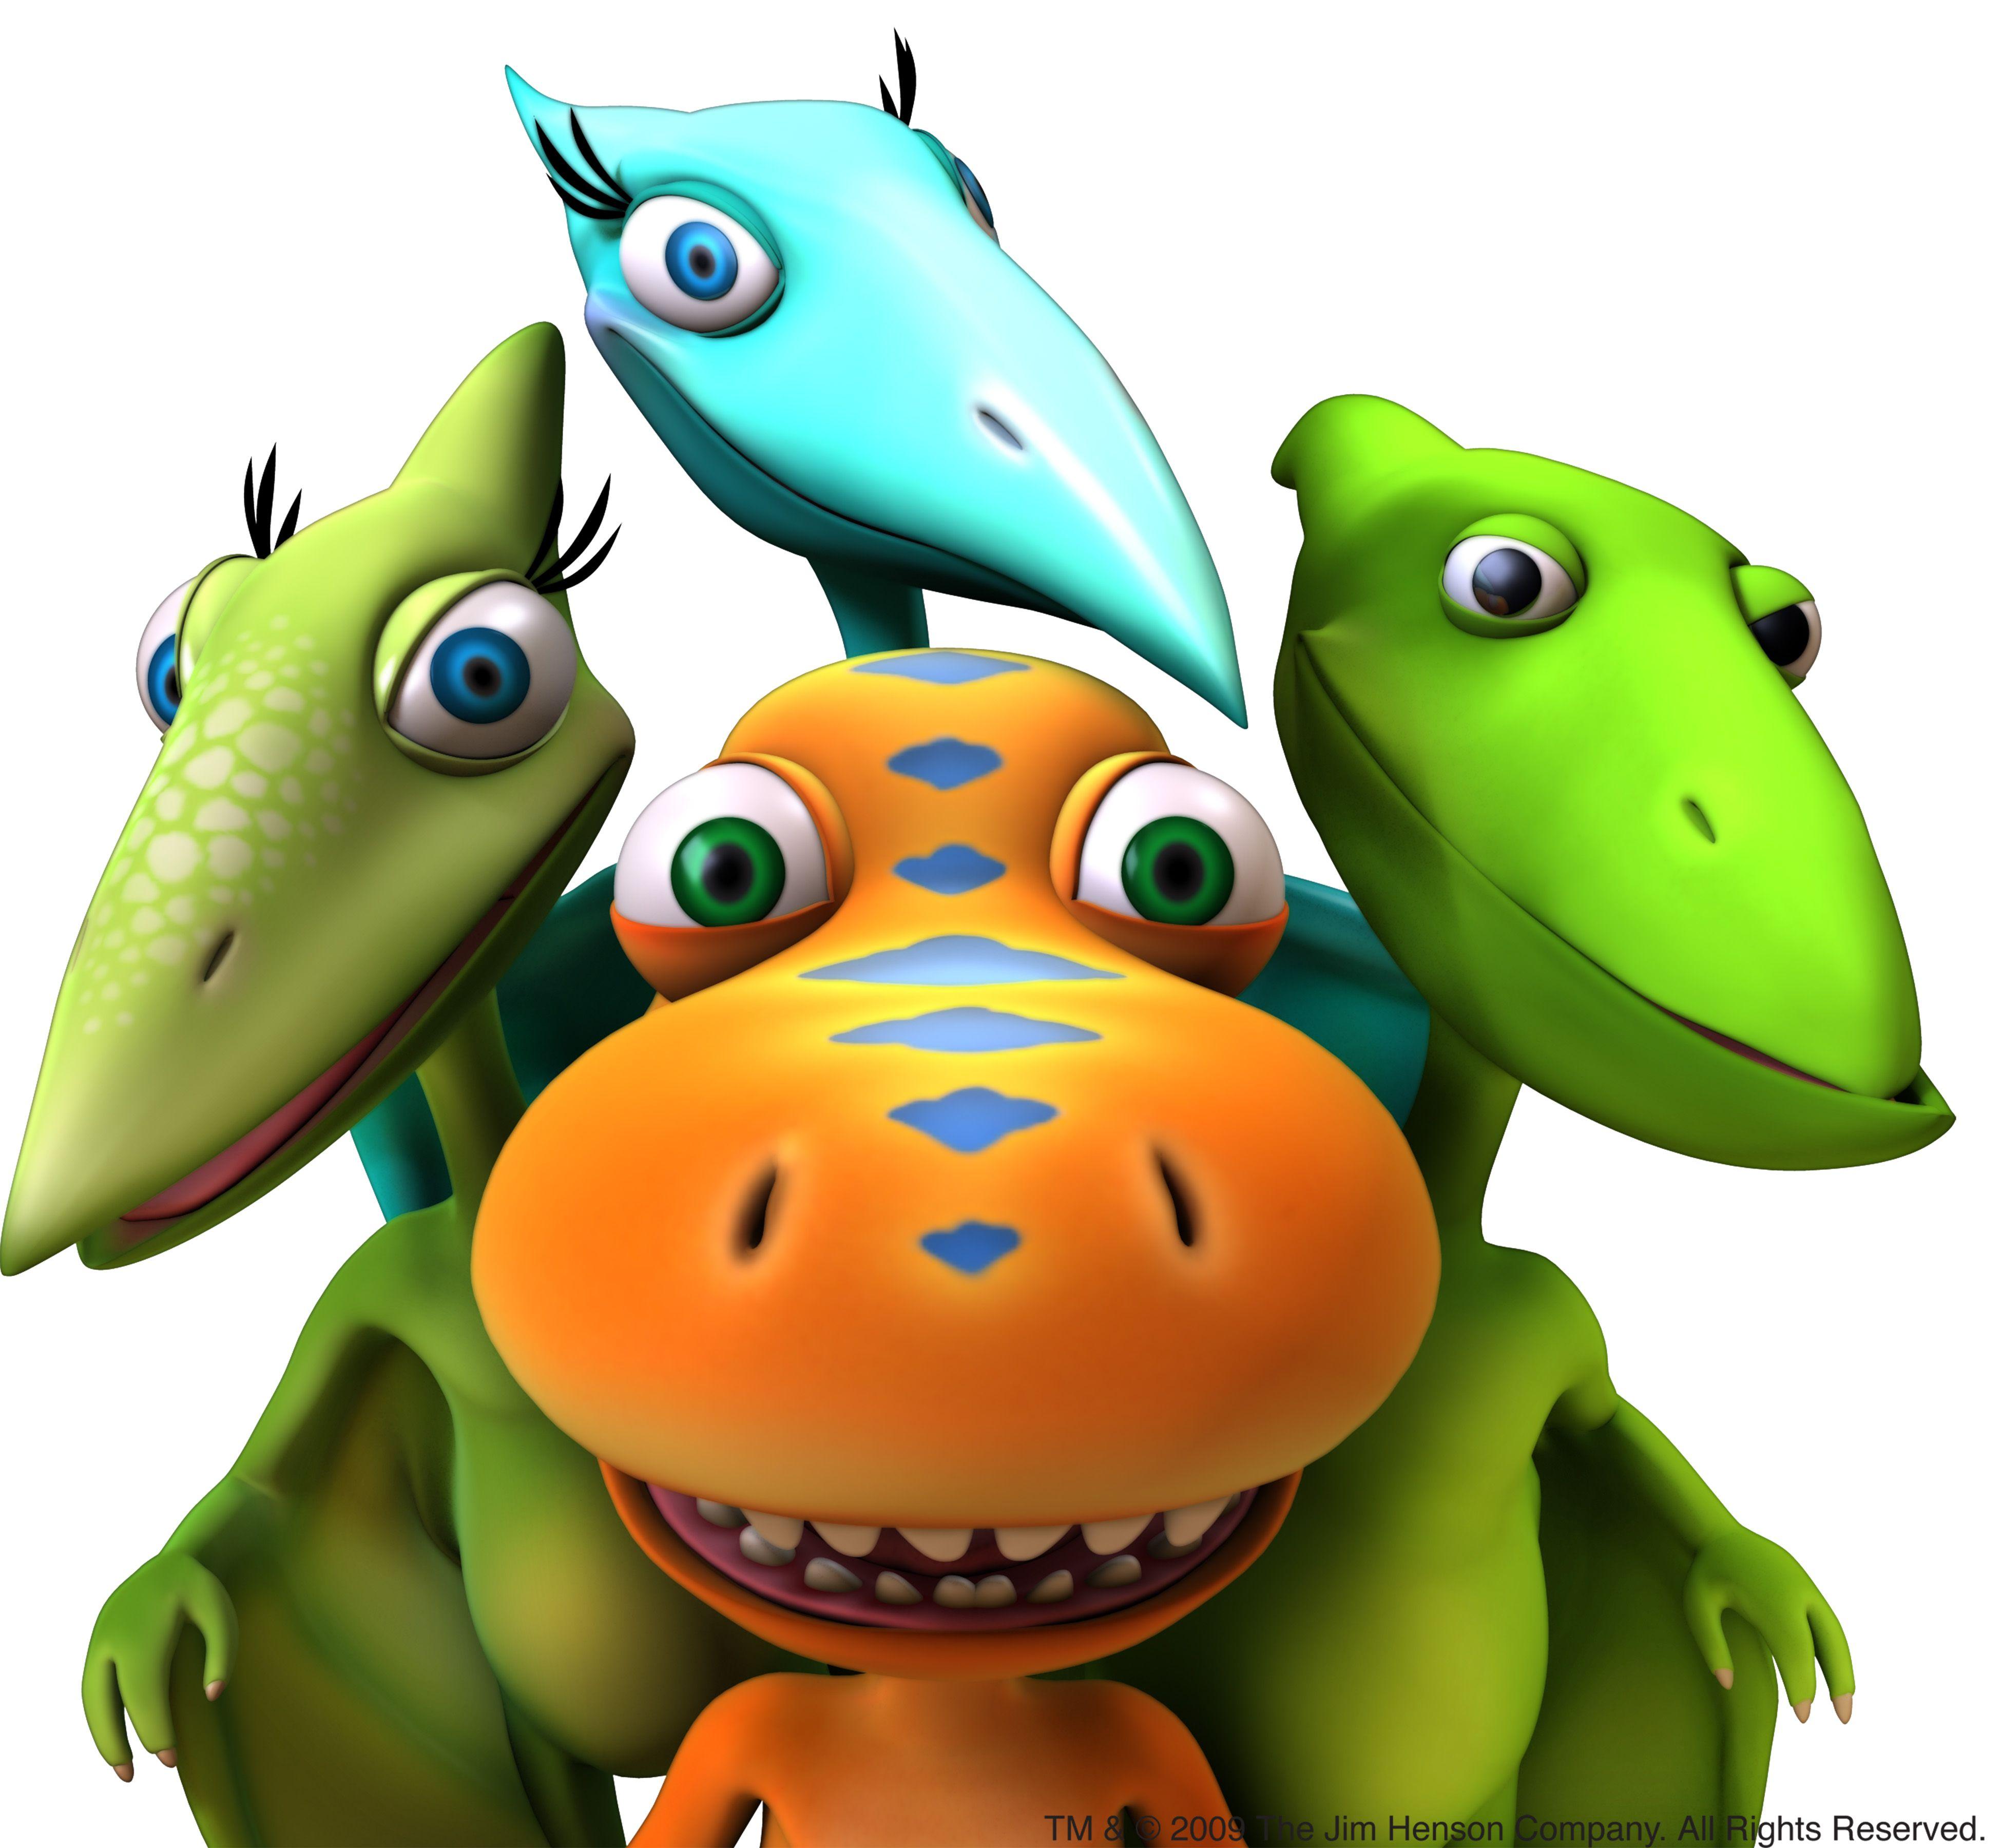 Buddy, Tiny, Shiny and Don. | dinosaur birthday | Pinterest ...